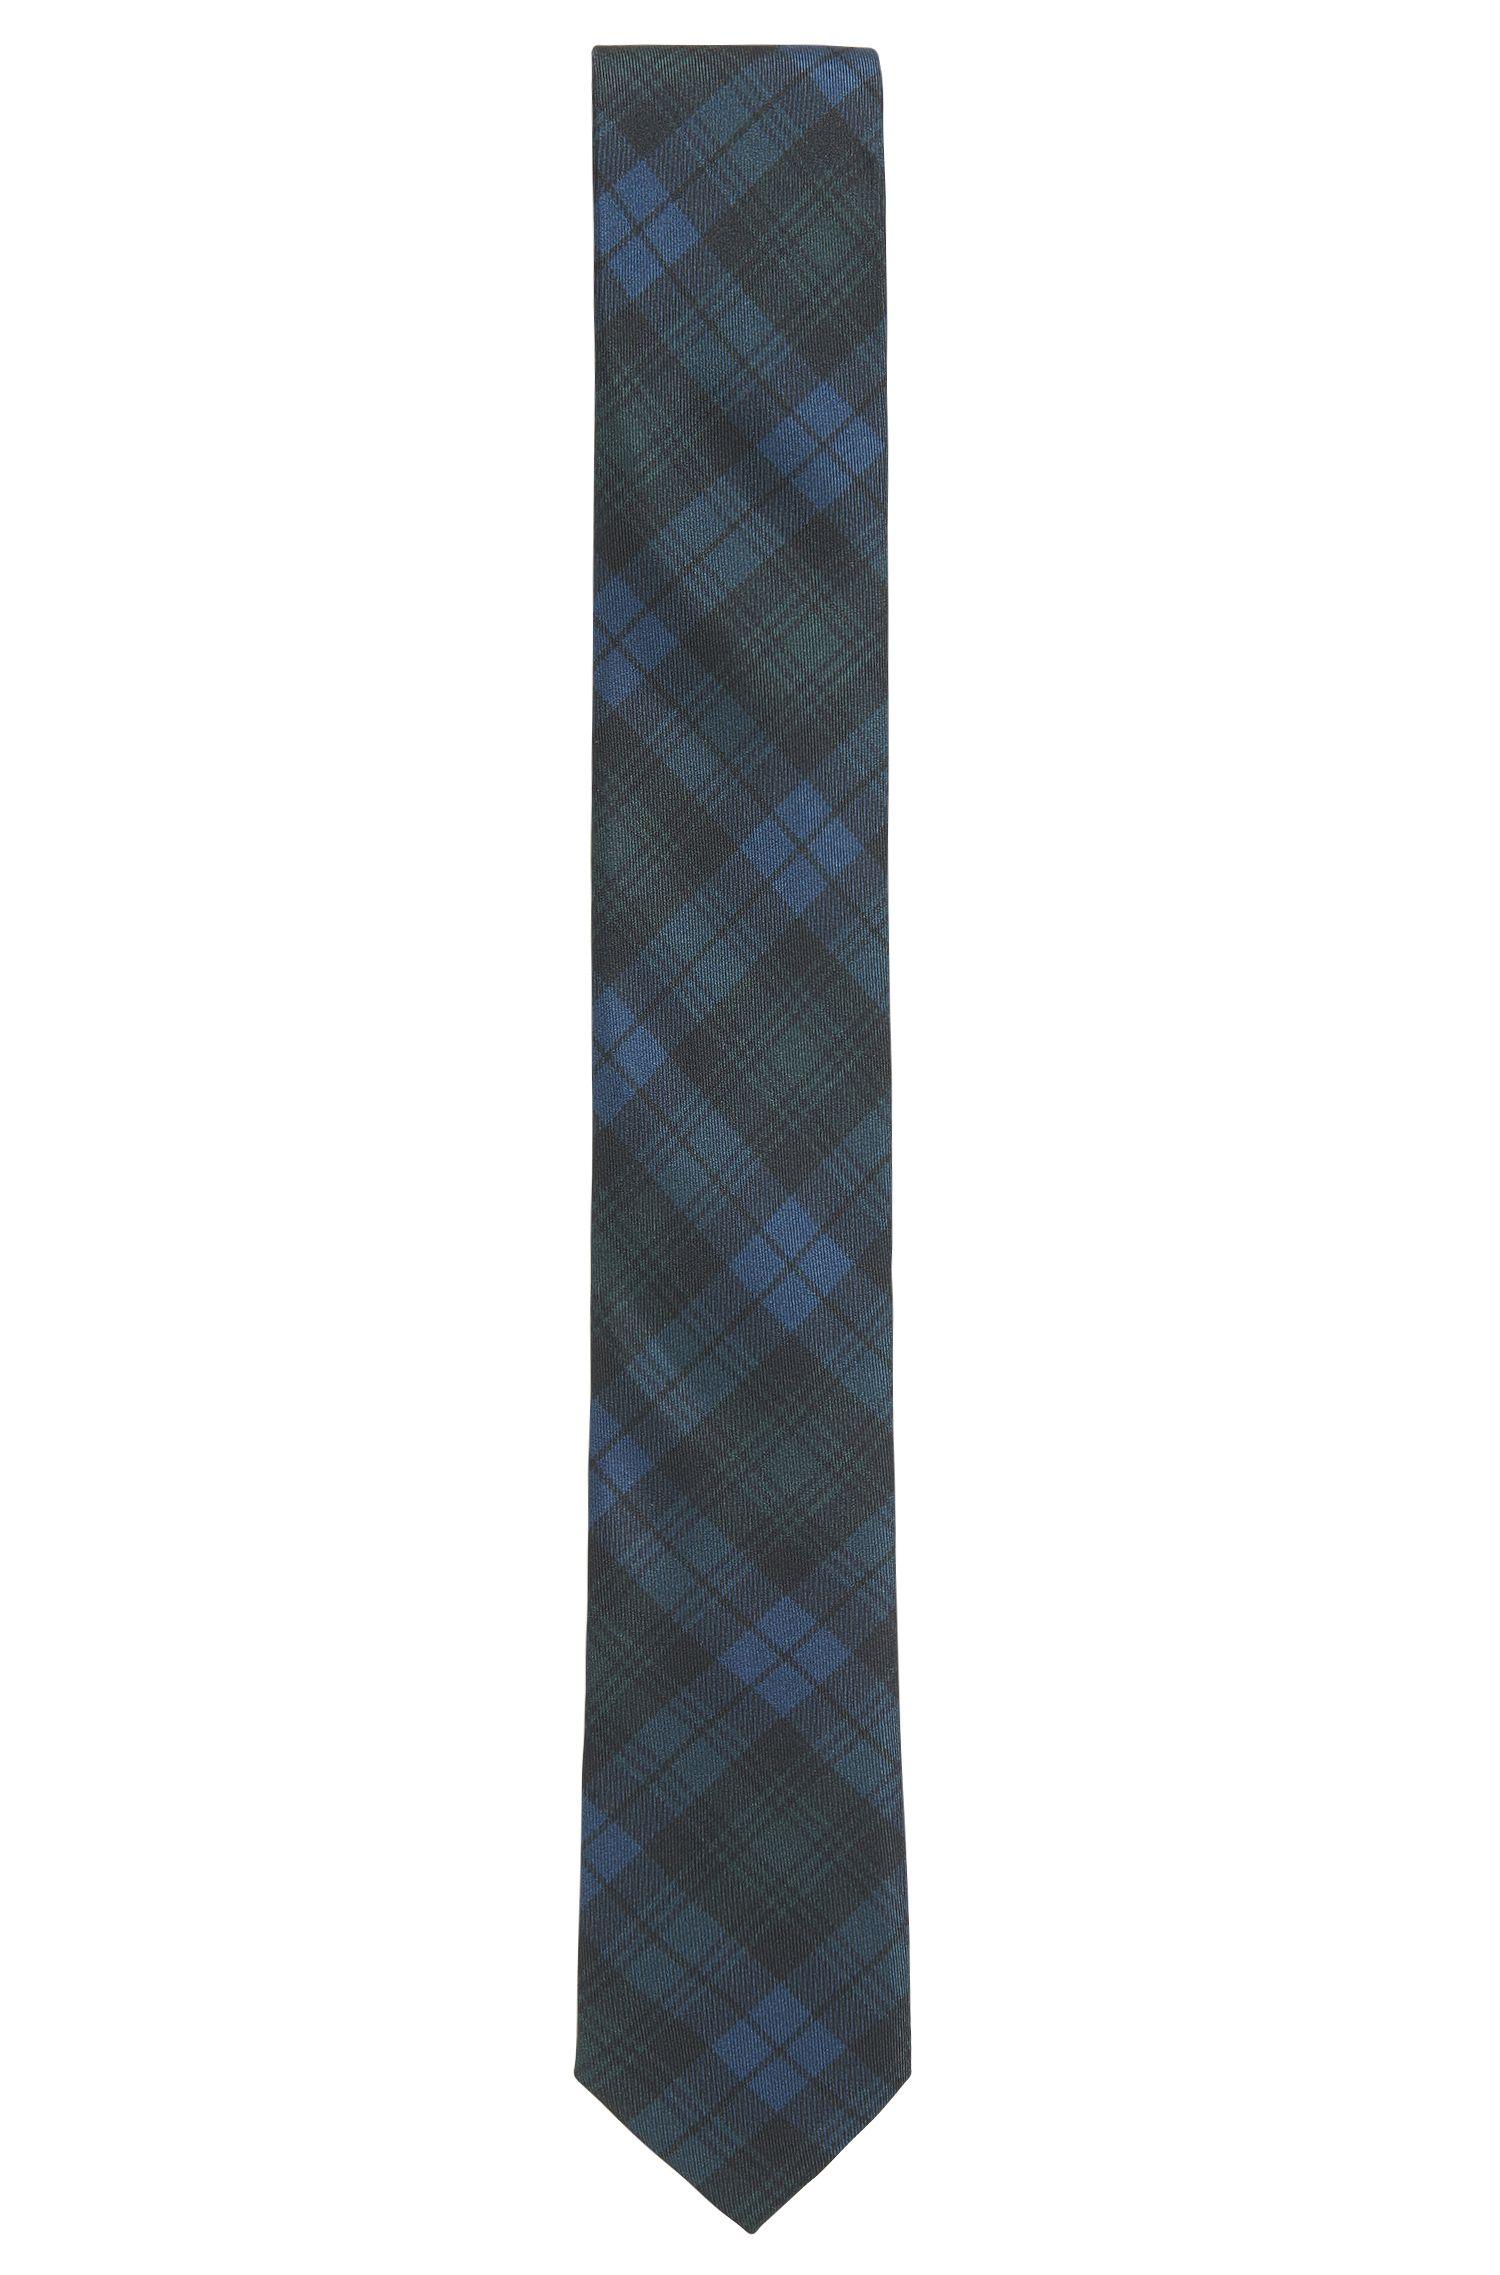 Black Watch Plaid Italian Silk Slim Tie